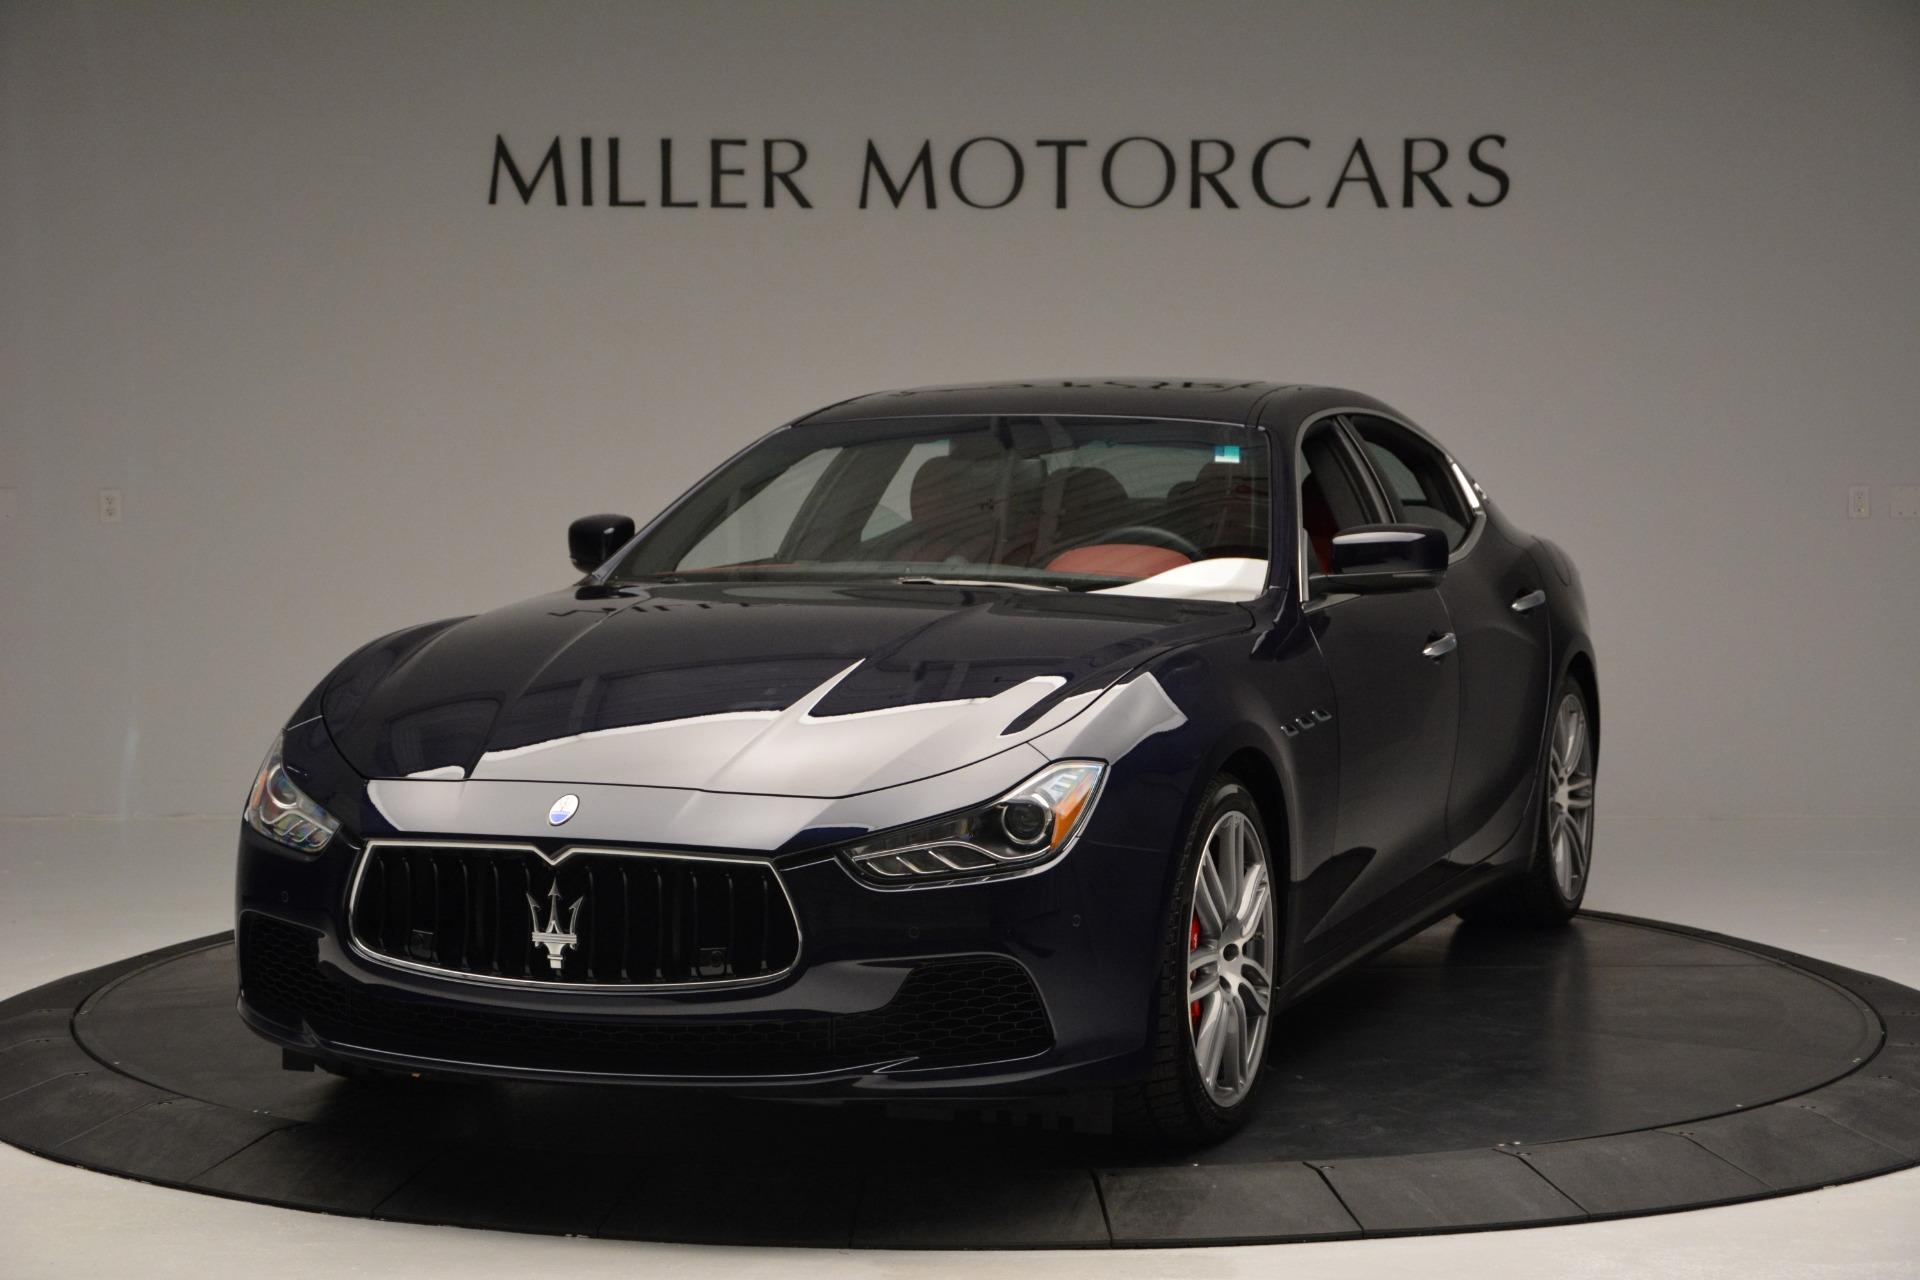 New 2017 Maserati Ghibli S Q4 For Sale In Greenwich, CT 849_main